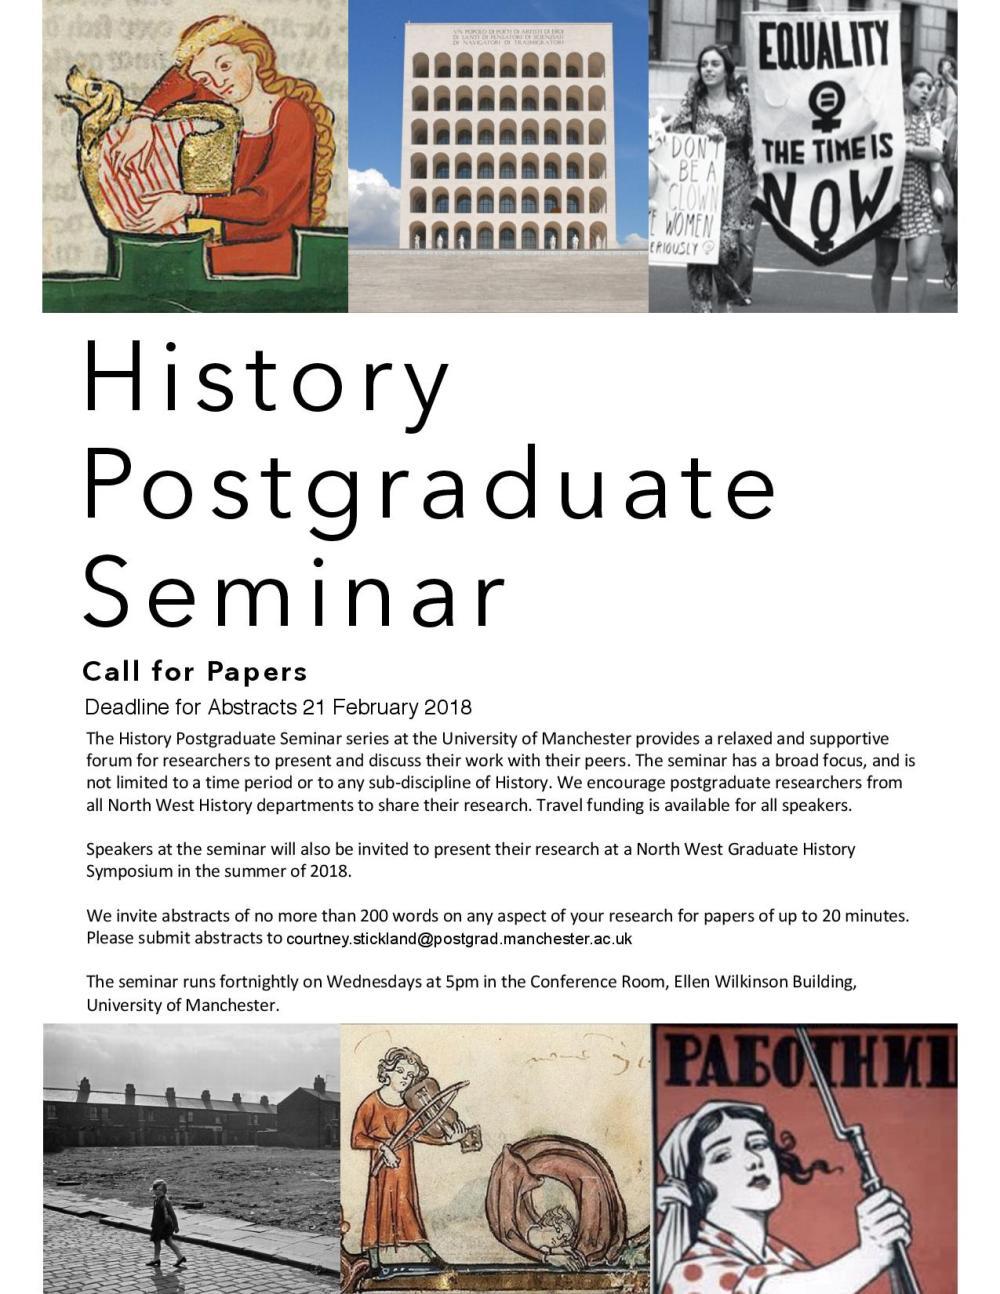 Manchester History Postgraduate Seminar internal-page-001